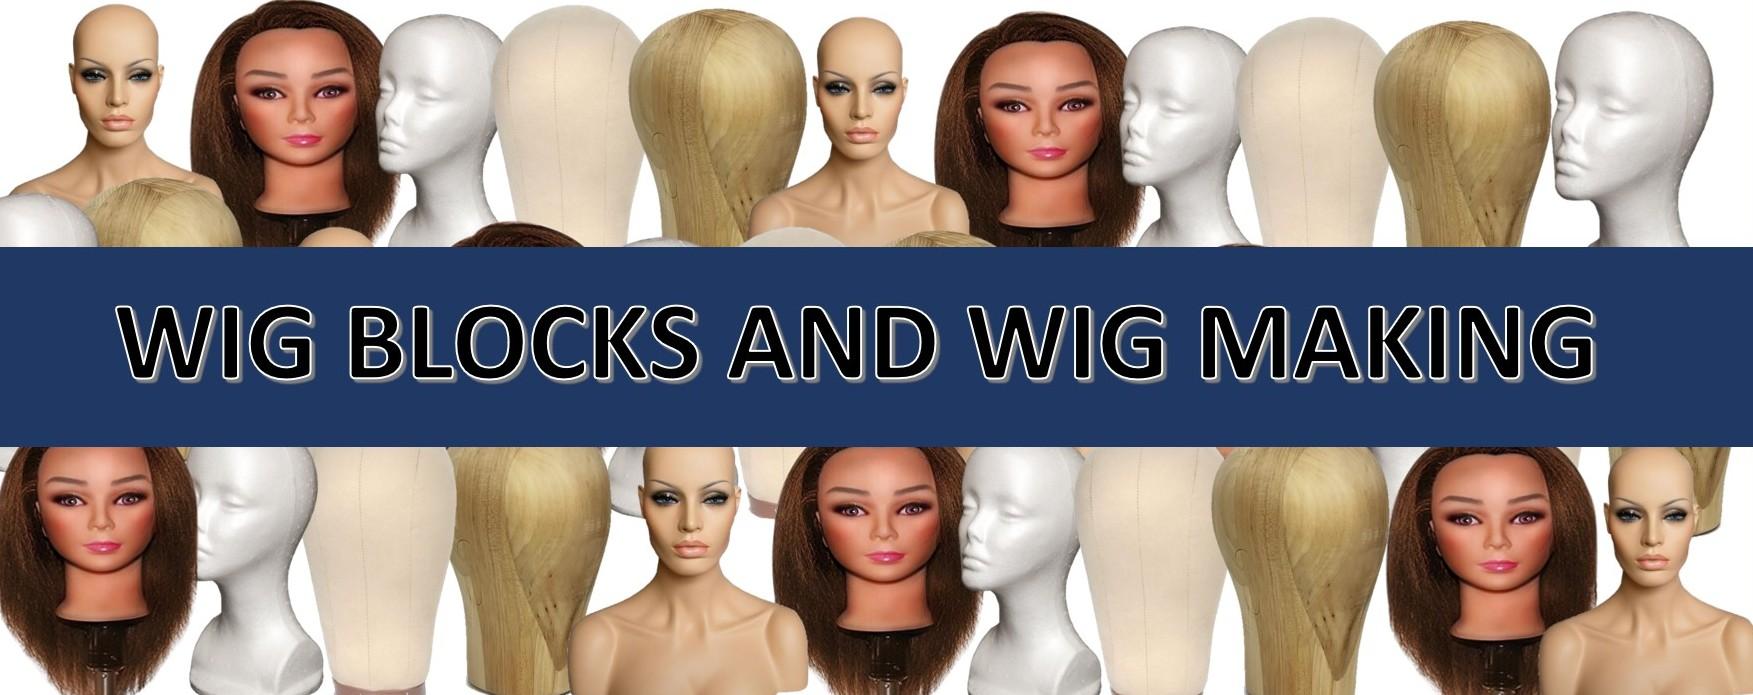 Wig Blocks and Wig Making